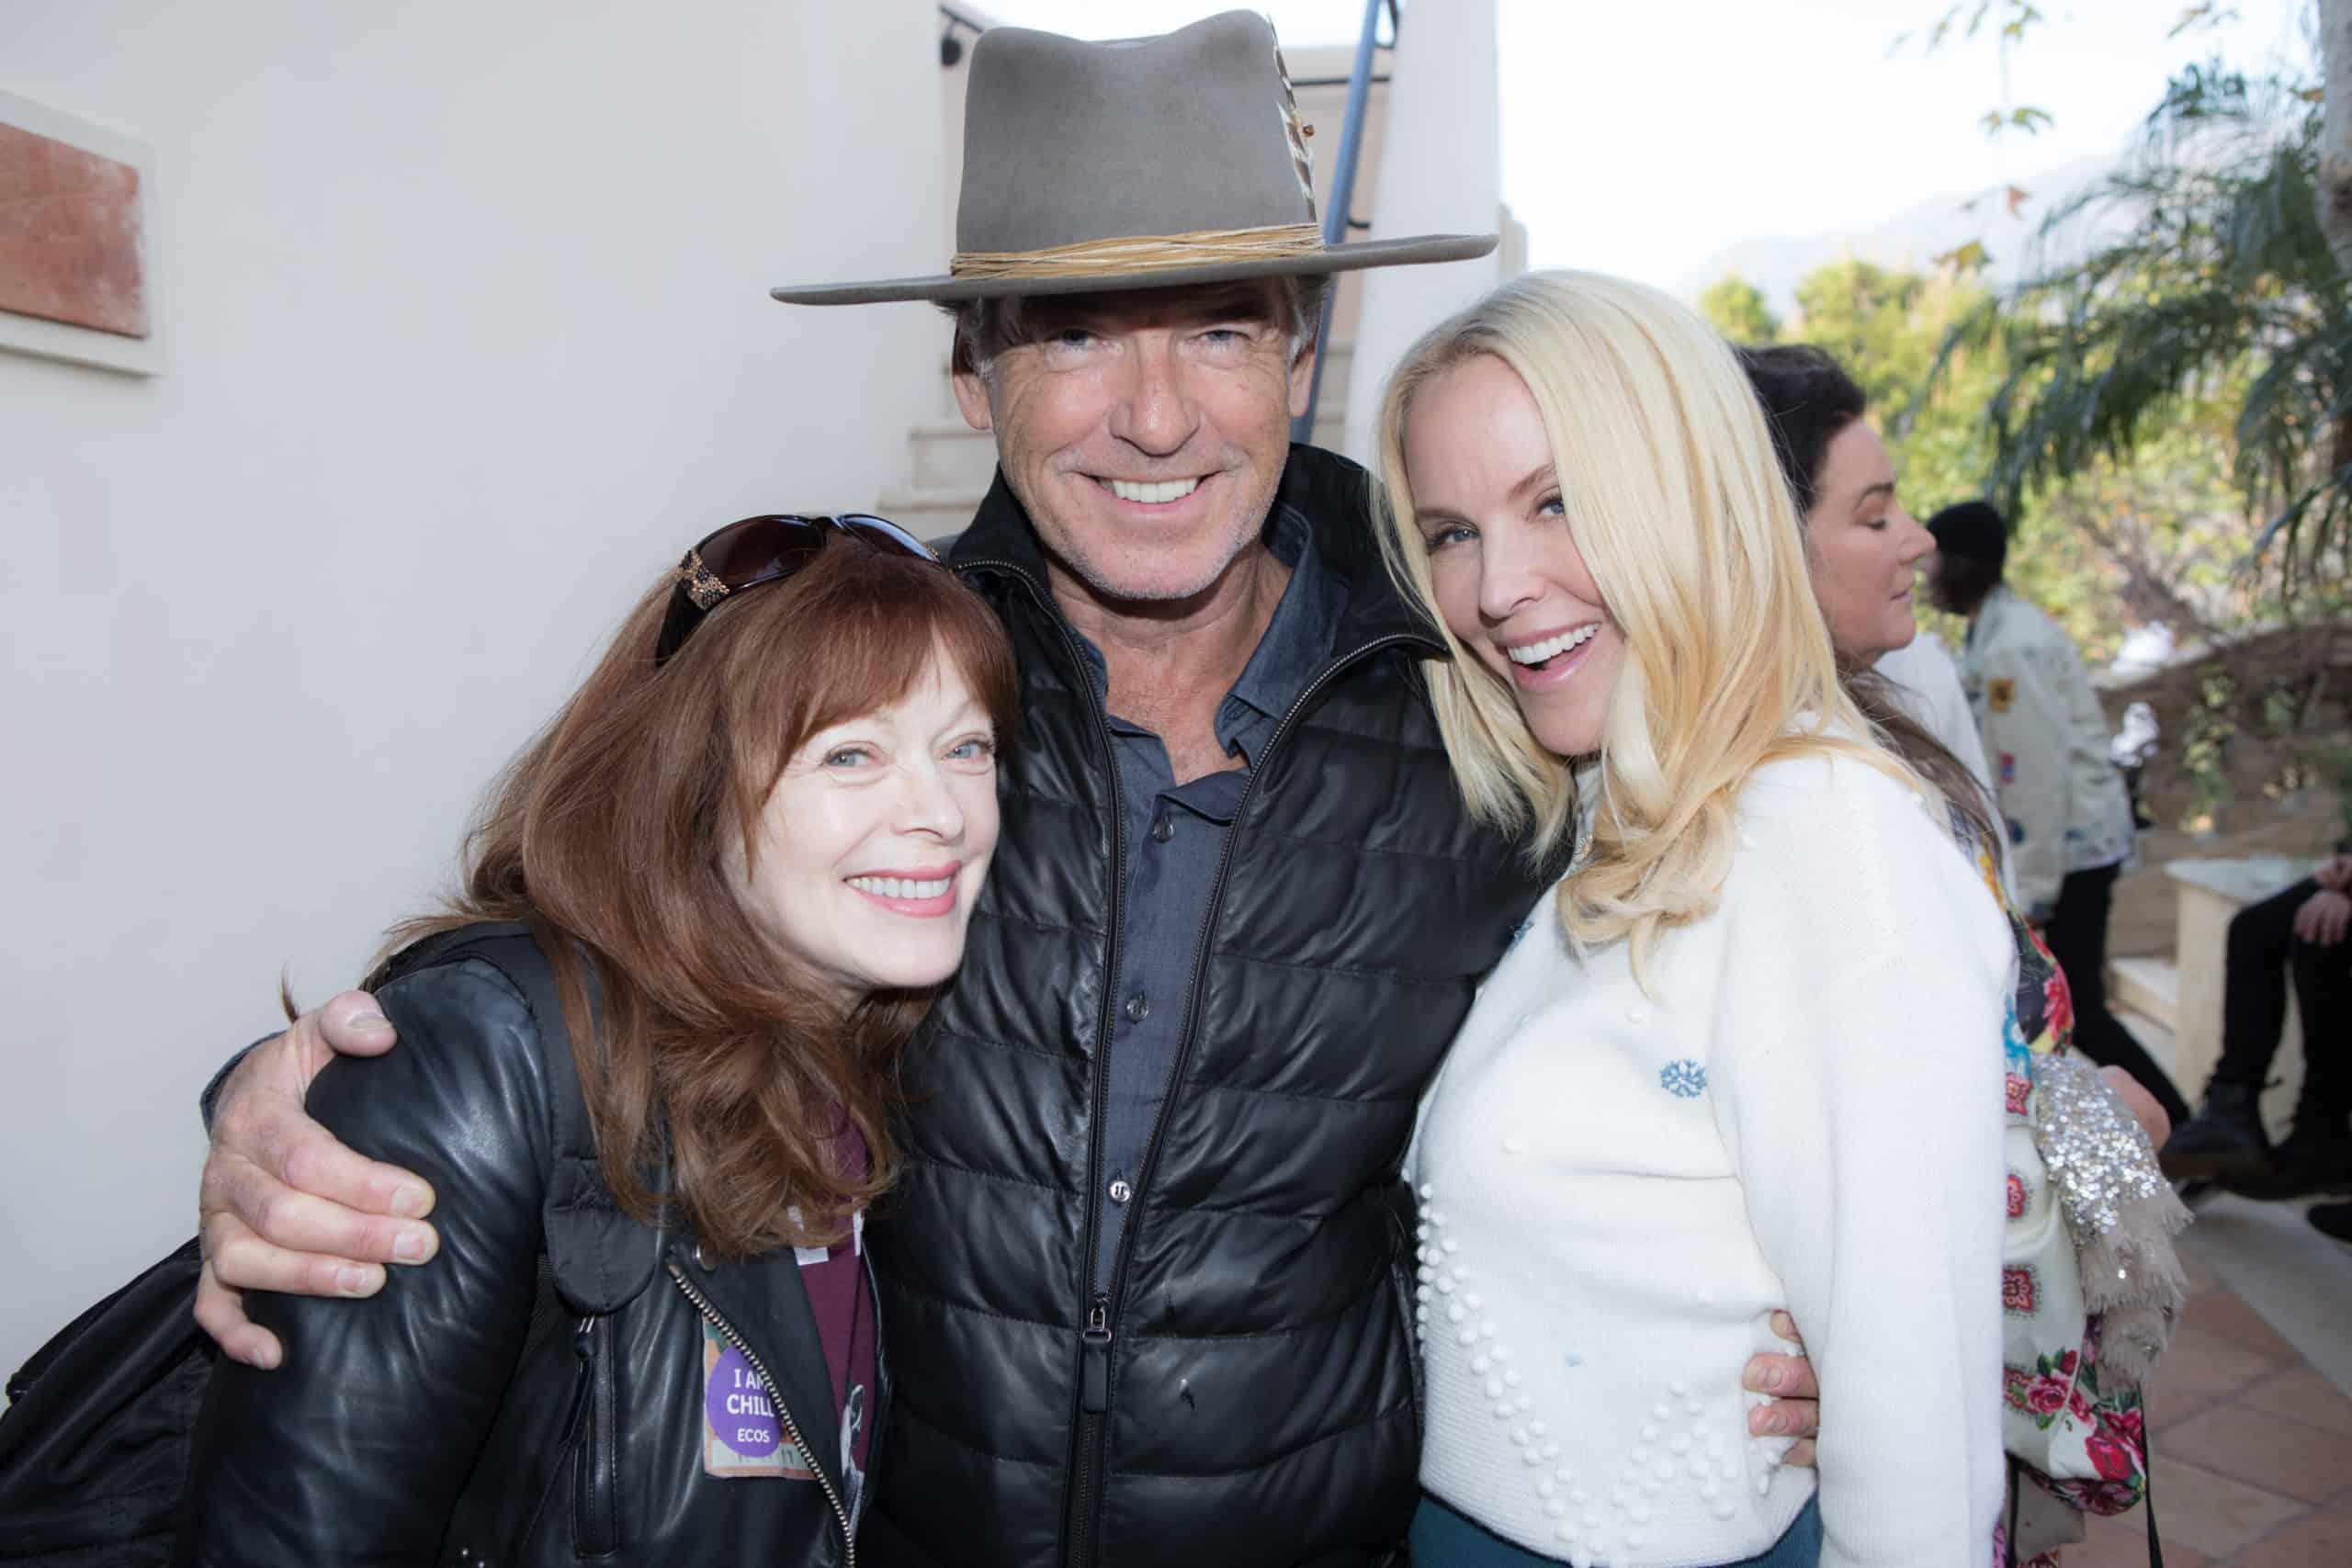 Frances Fisher, Pierce Brosnan and Eloise DeJoria